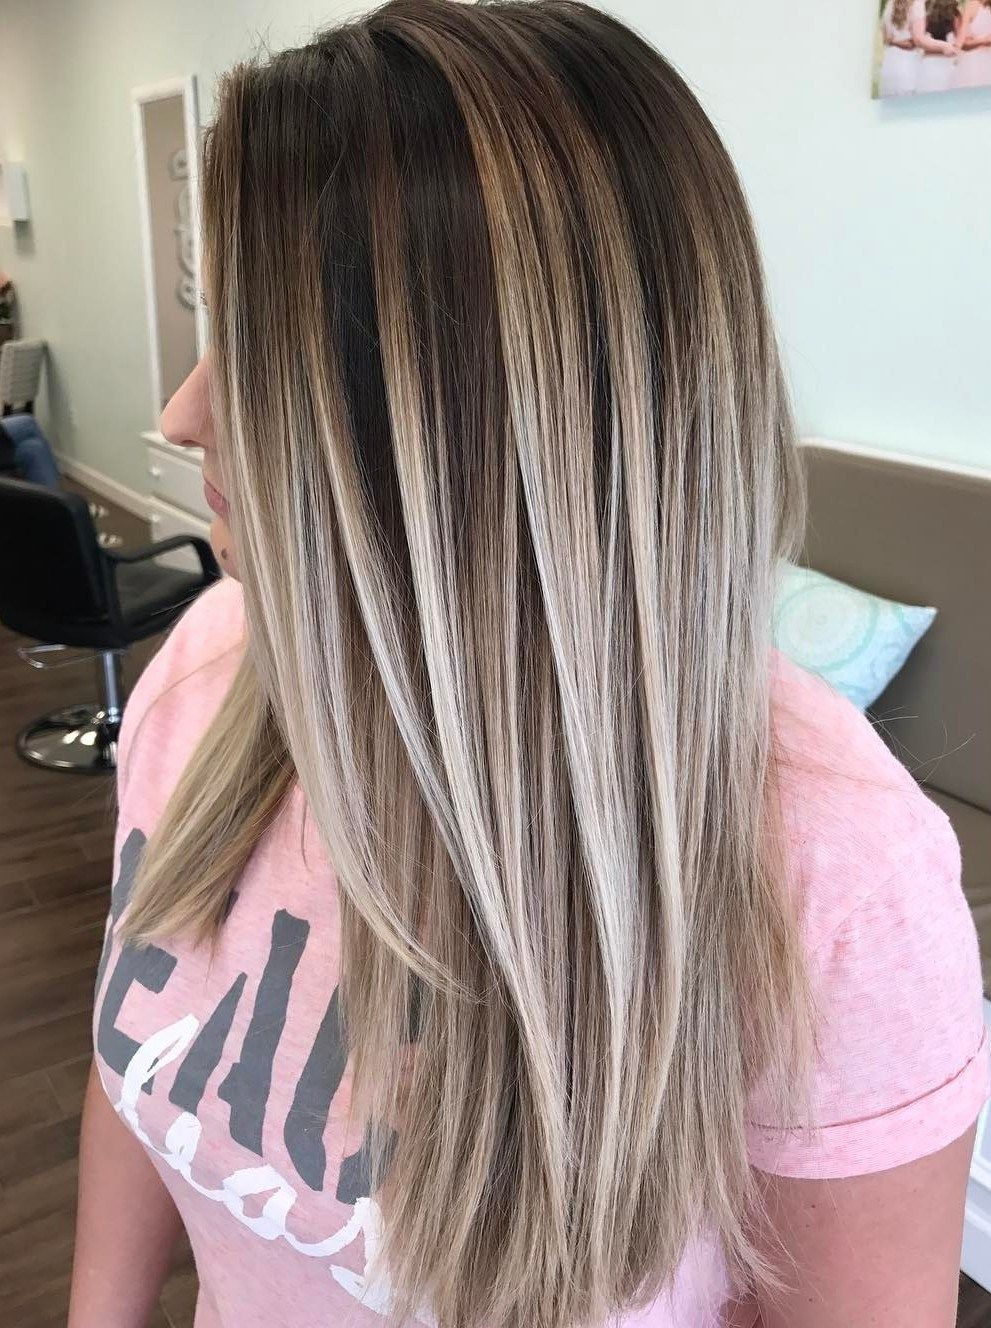 70 Flattering Balayage Hair Color Ideas For 2020 Balayage Straight Hair Hair Styles Hair Painting